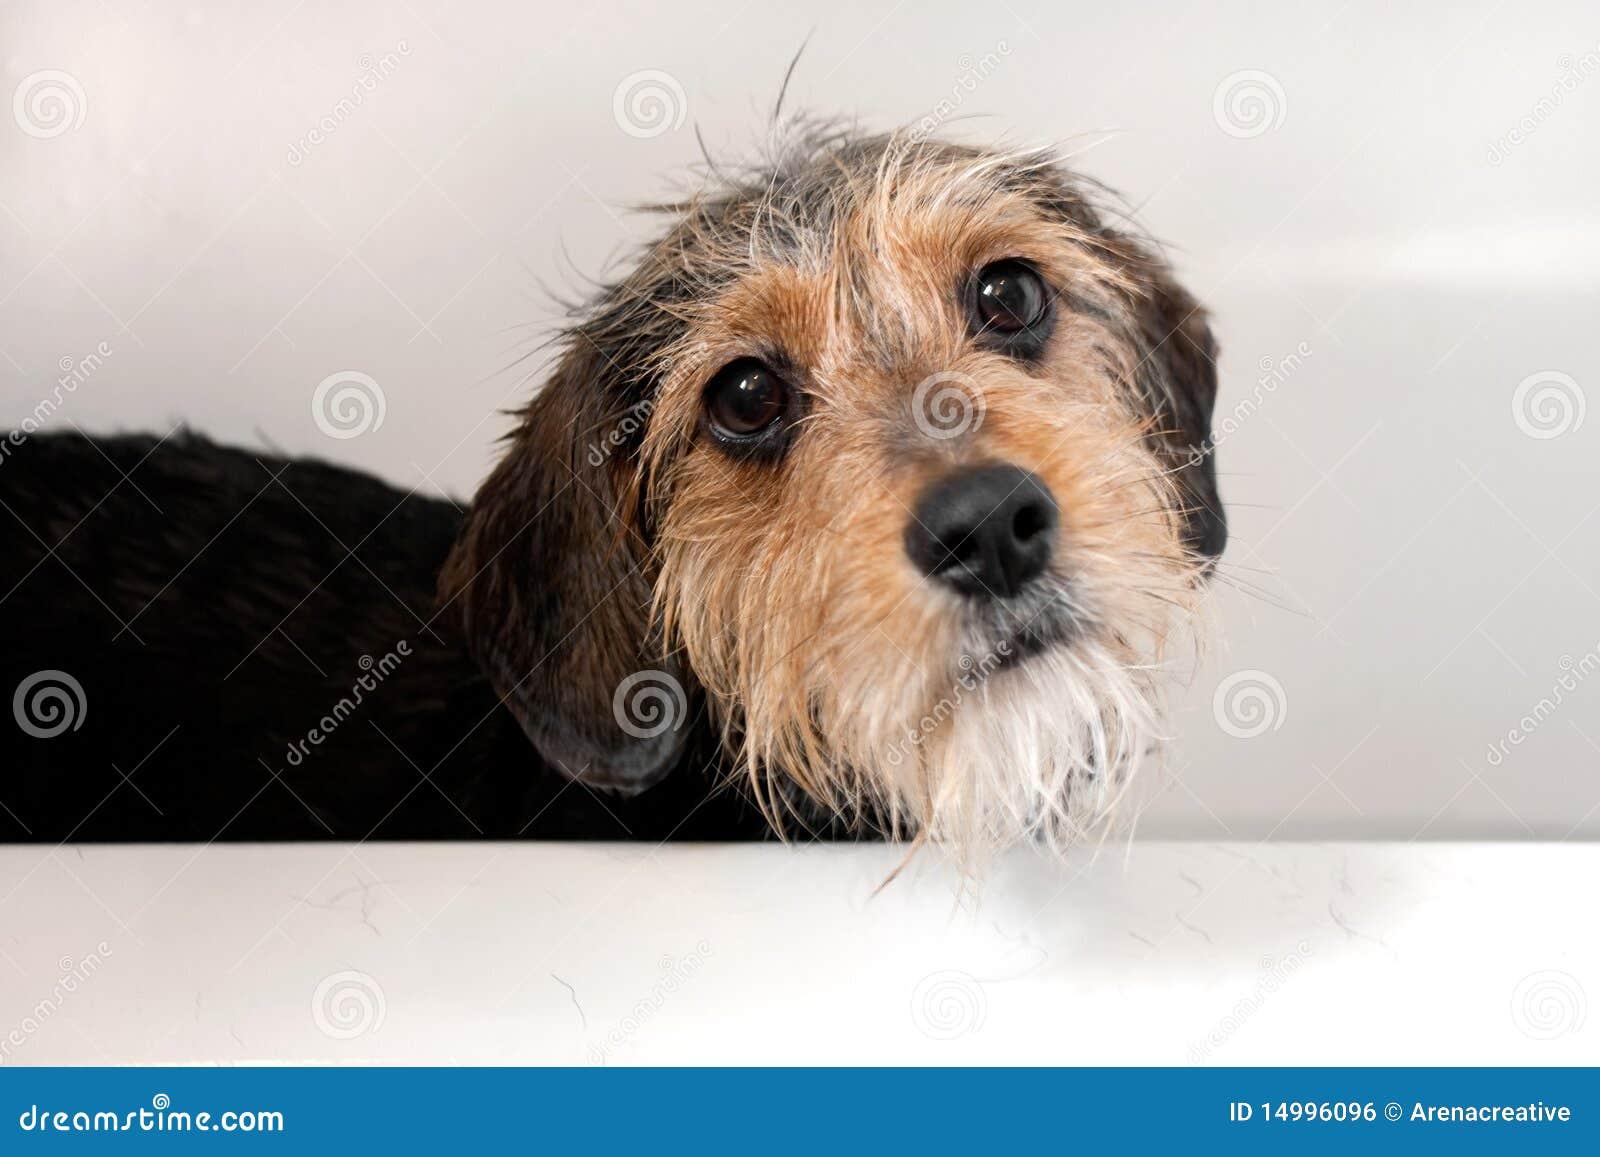 Perro en la tina de baño